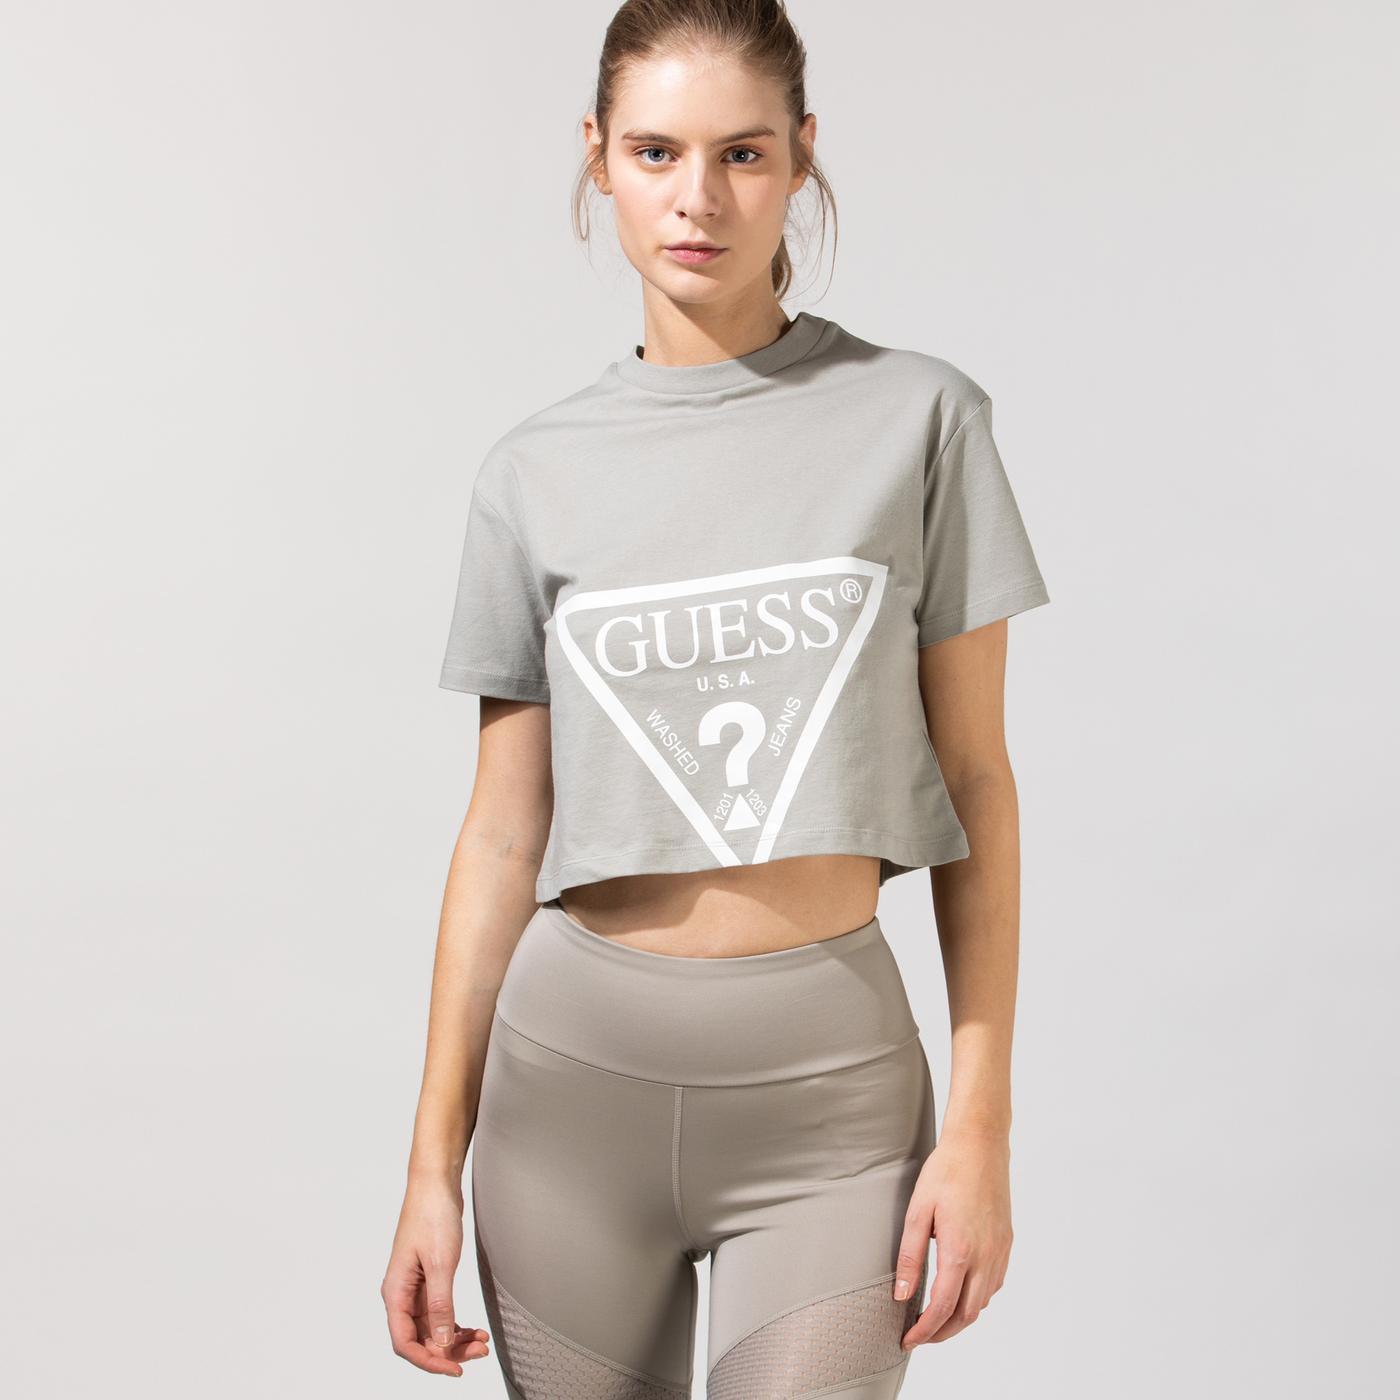 Guess Kadın Gri T-Shirt